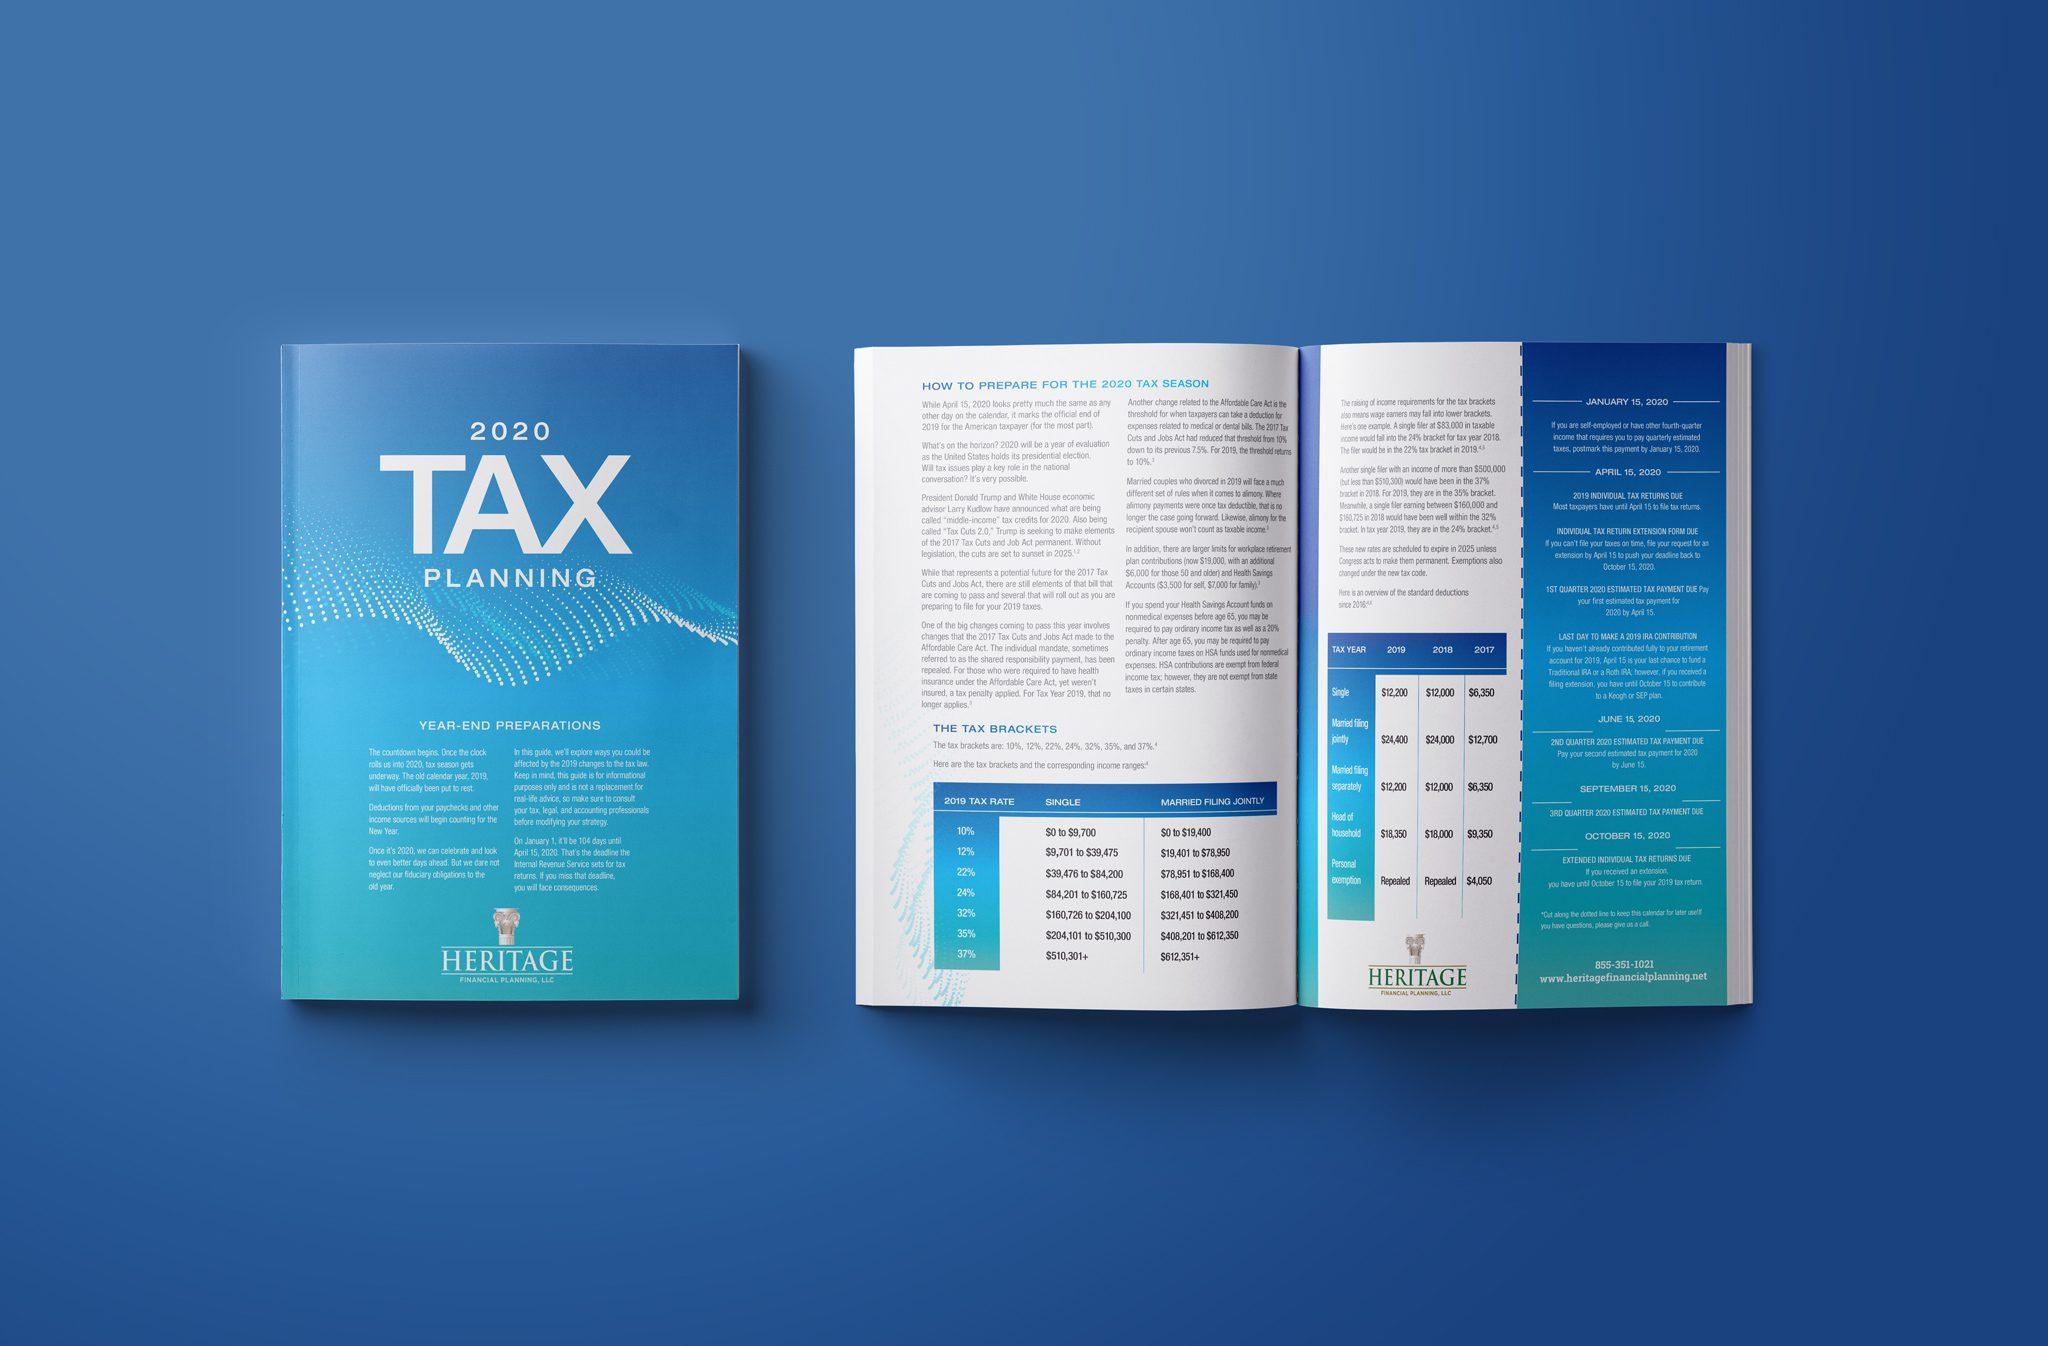 2020 Tax Planning